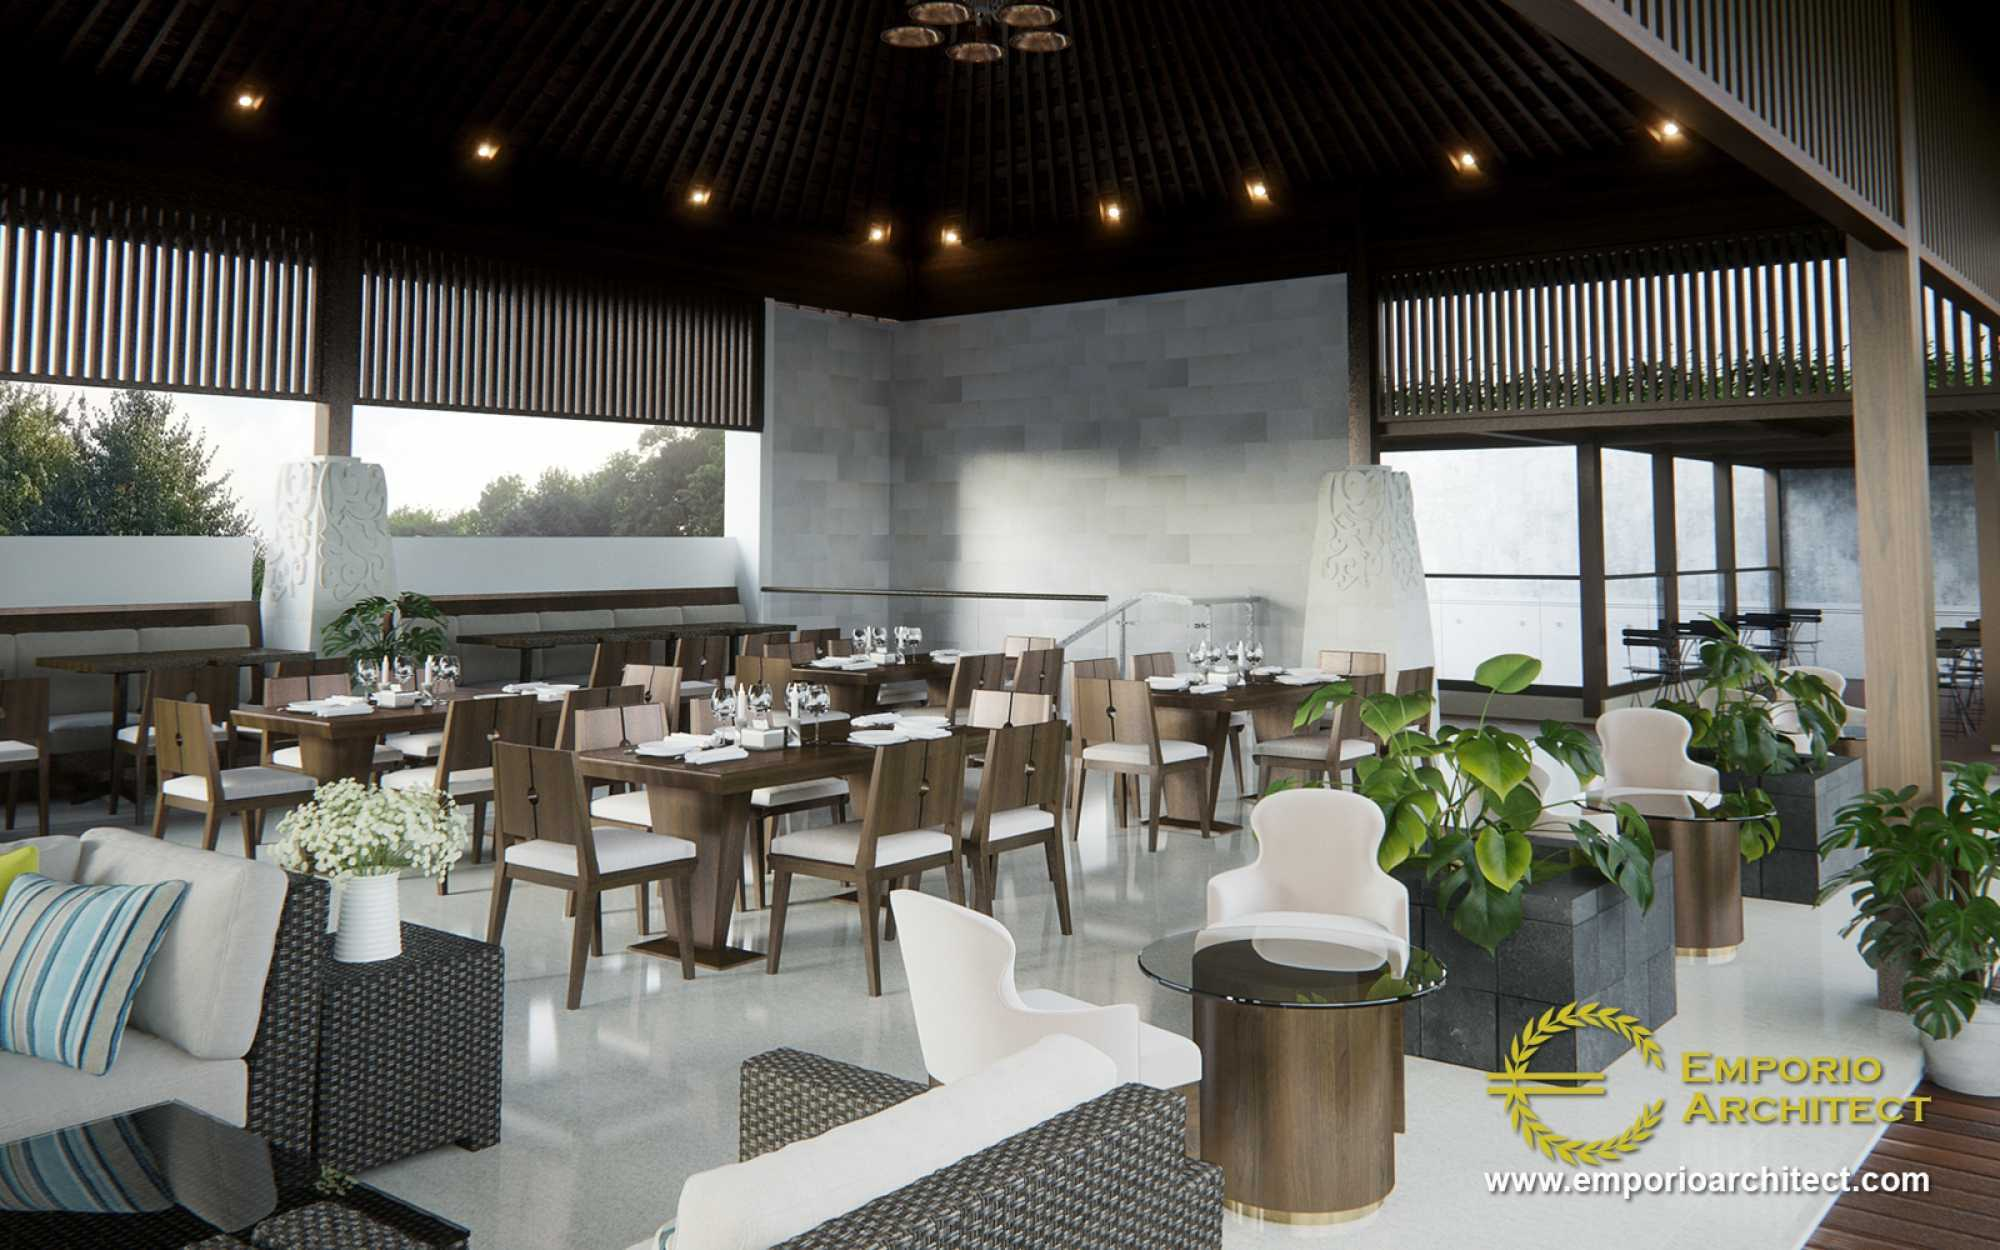 Emporio Architect Desain Hostel Villa Bali Tropis 311 @ Berawa, Canggu, Bali A Branch Of Serenity Eco Guesthouse, Just 2.6 Km Away, Canggu, Badung, Kabupaten Badung, Bali 80361, Indonesia A Branch Of Serenity Eco Guesthouse, Just 2.6 Km Away, Canggu, Badung, Kabupaten Badung, Bali 80361, Indonesia Emporio-Architect-Desain-Hostel-Villa-Bali-Tropis-311-Berawa-Canggu-Bali   74009